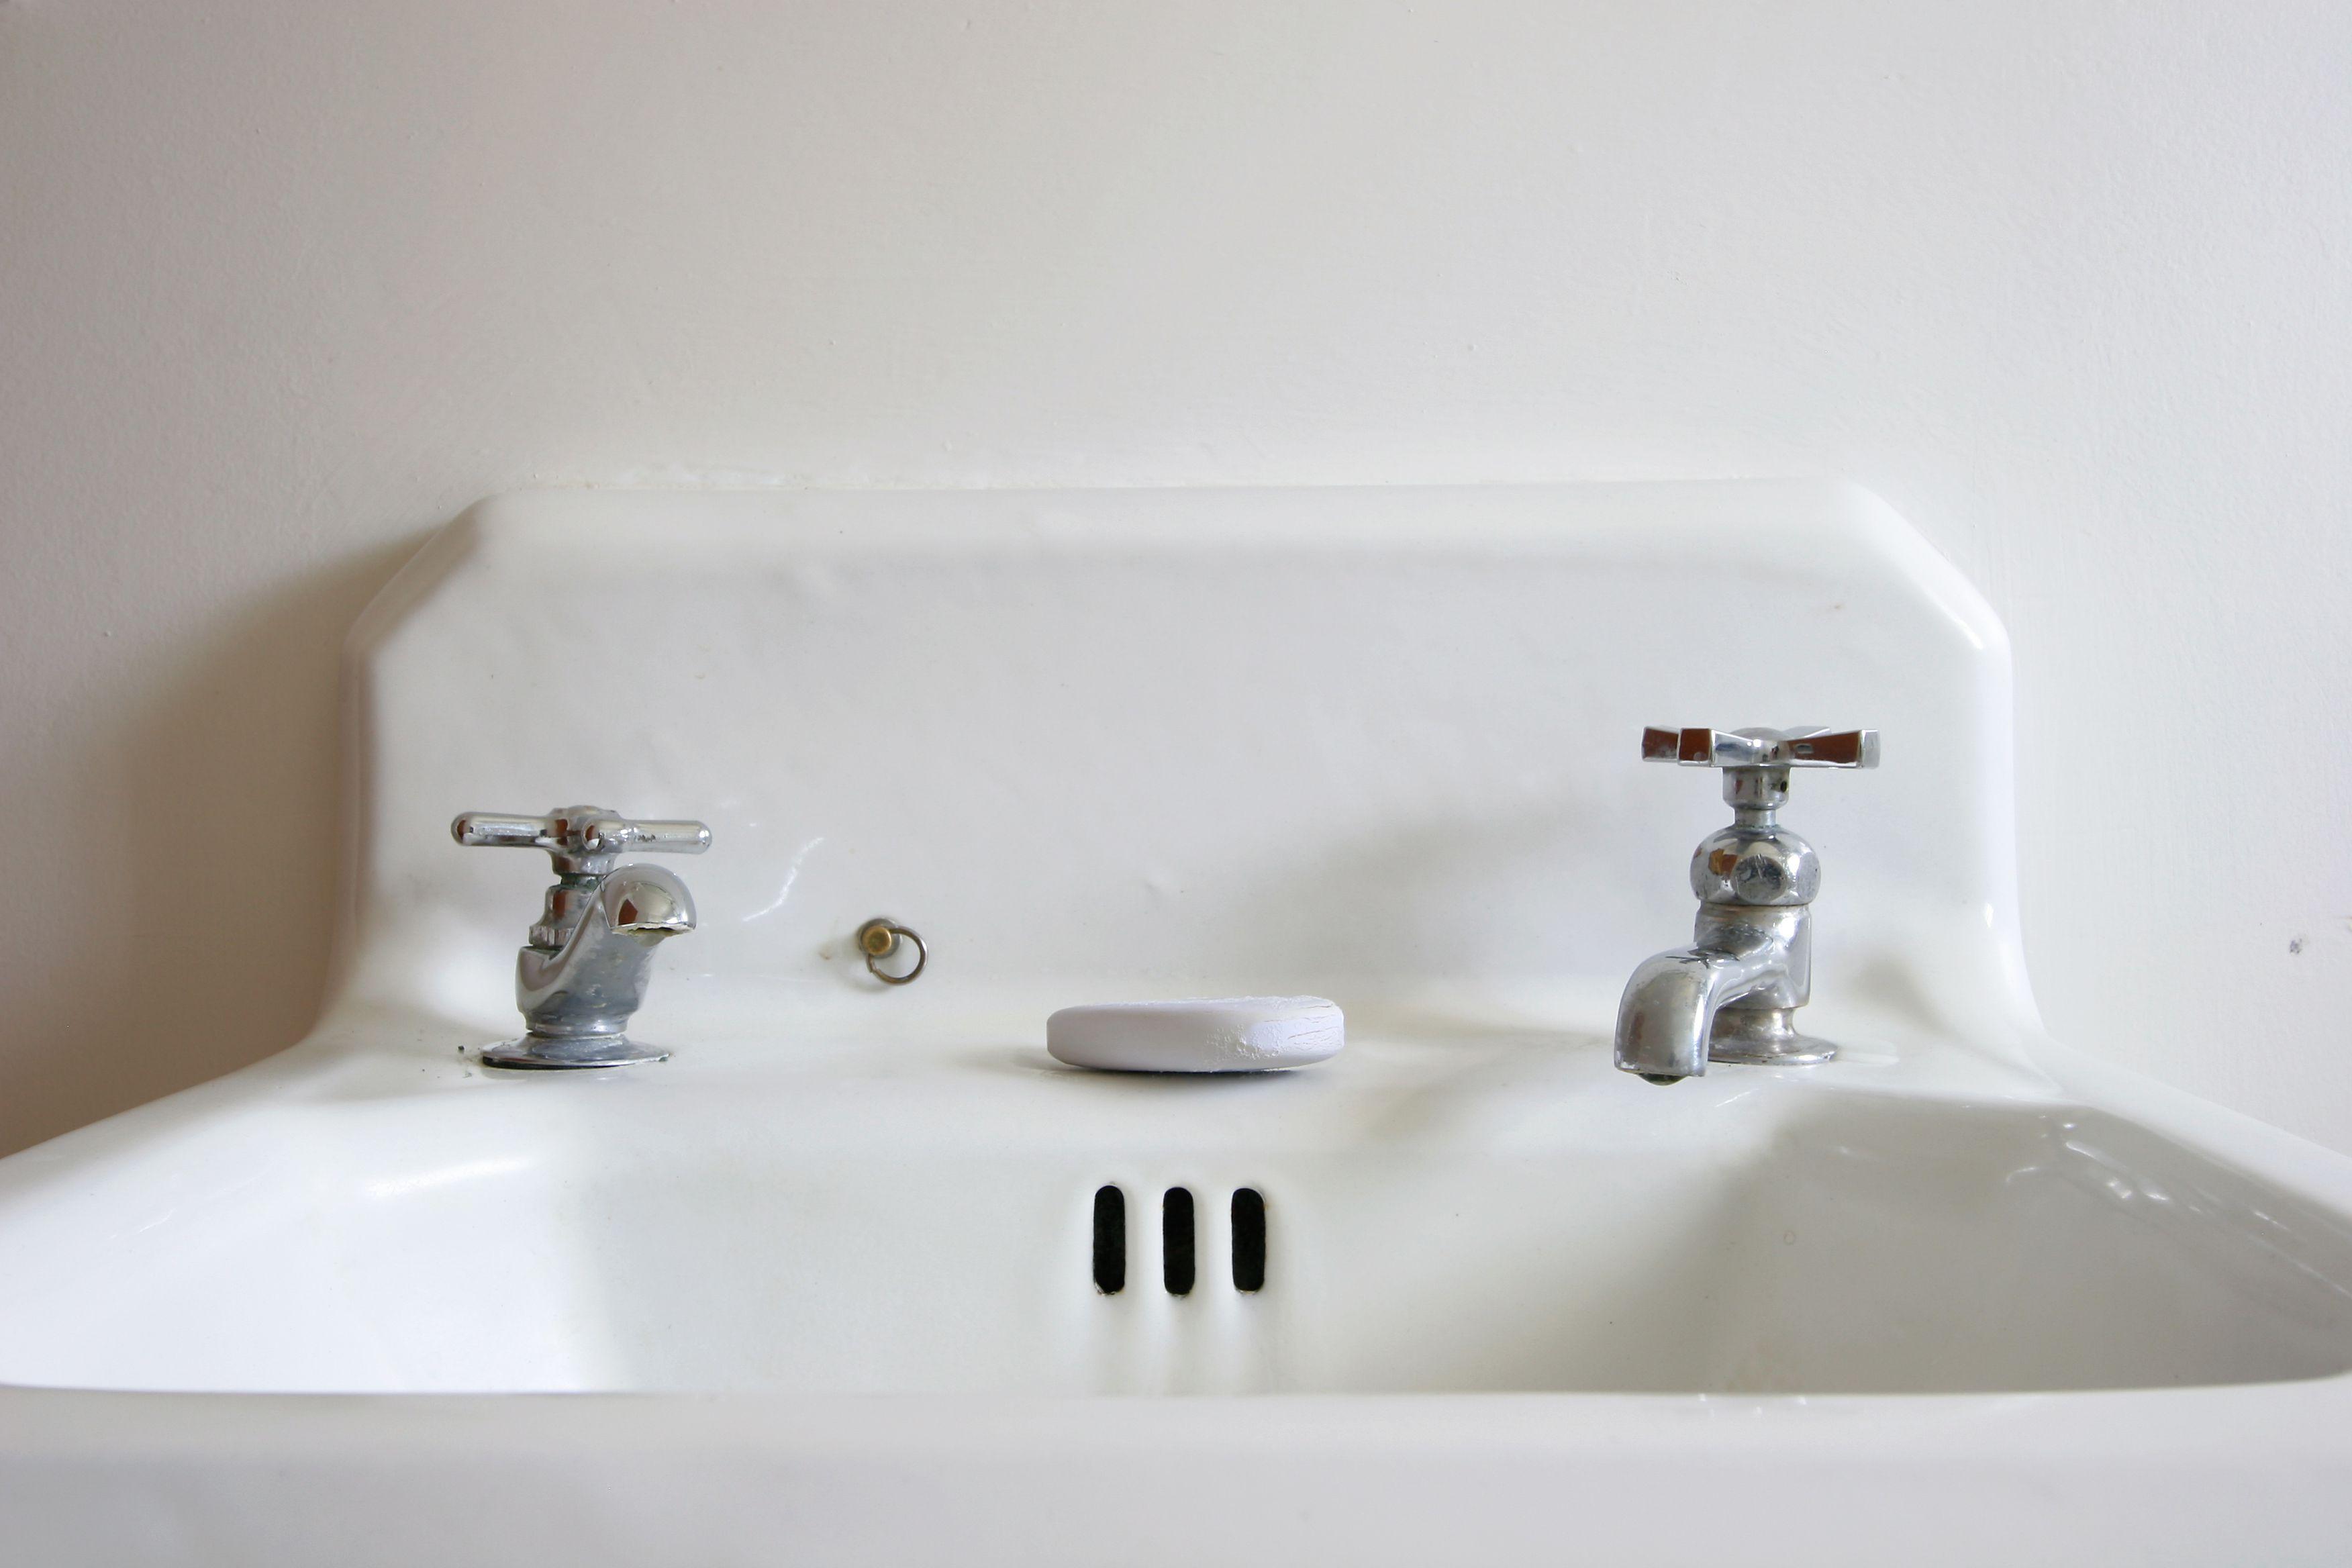 Bathroom Sink Vent